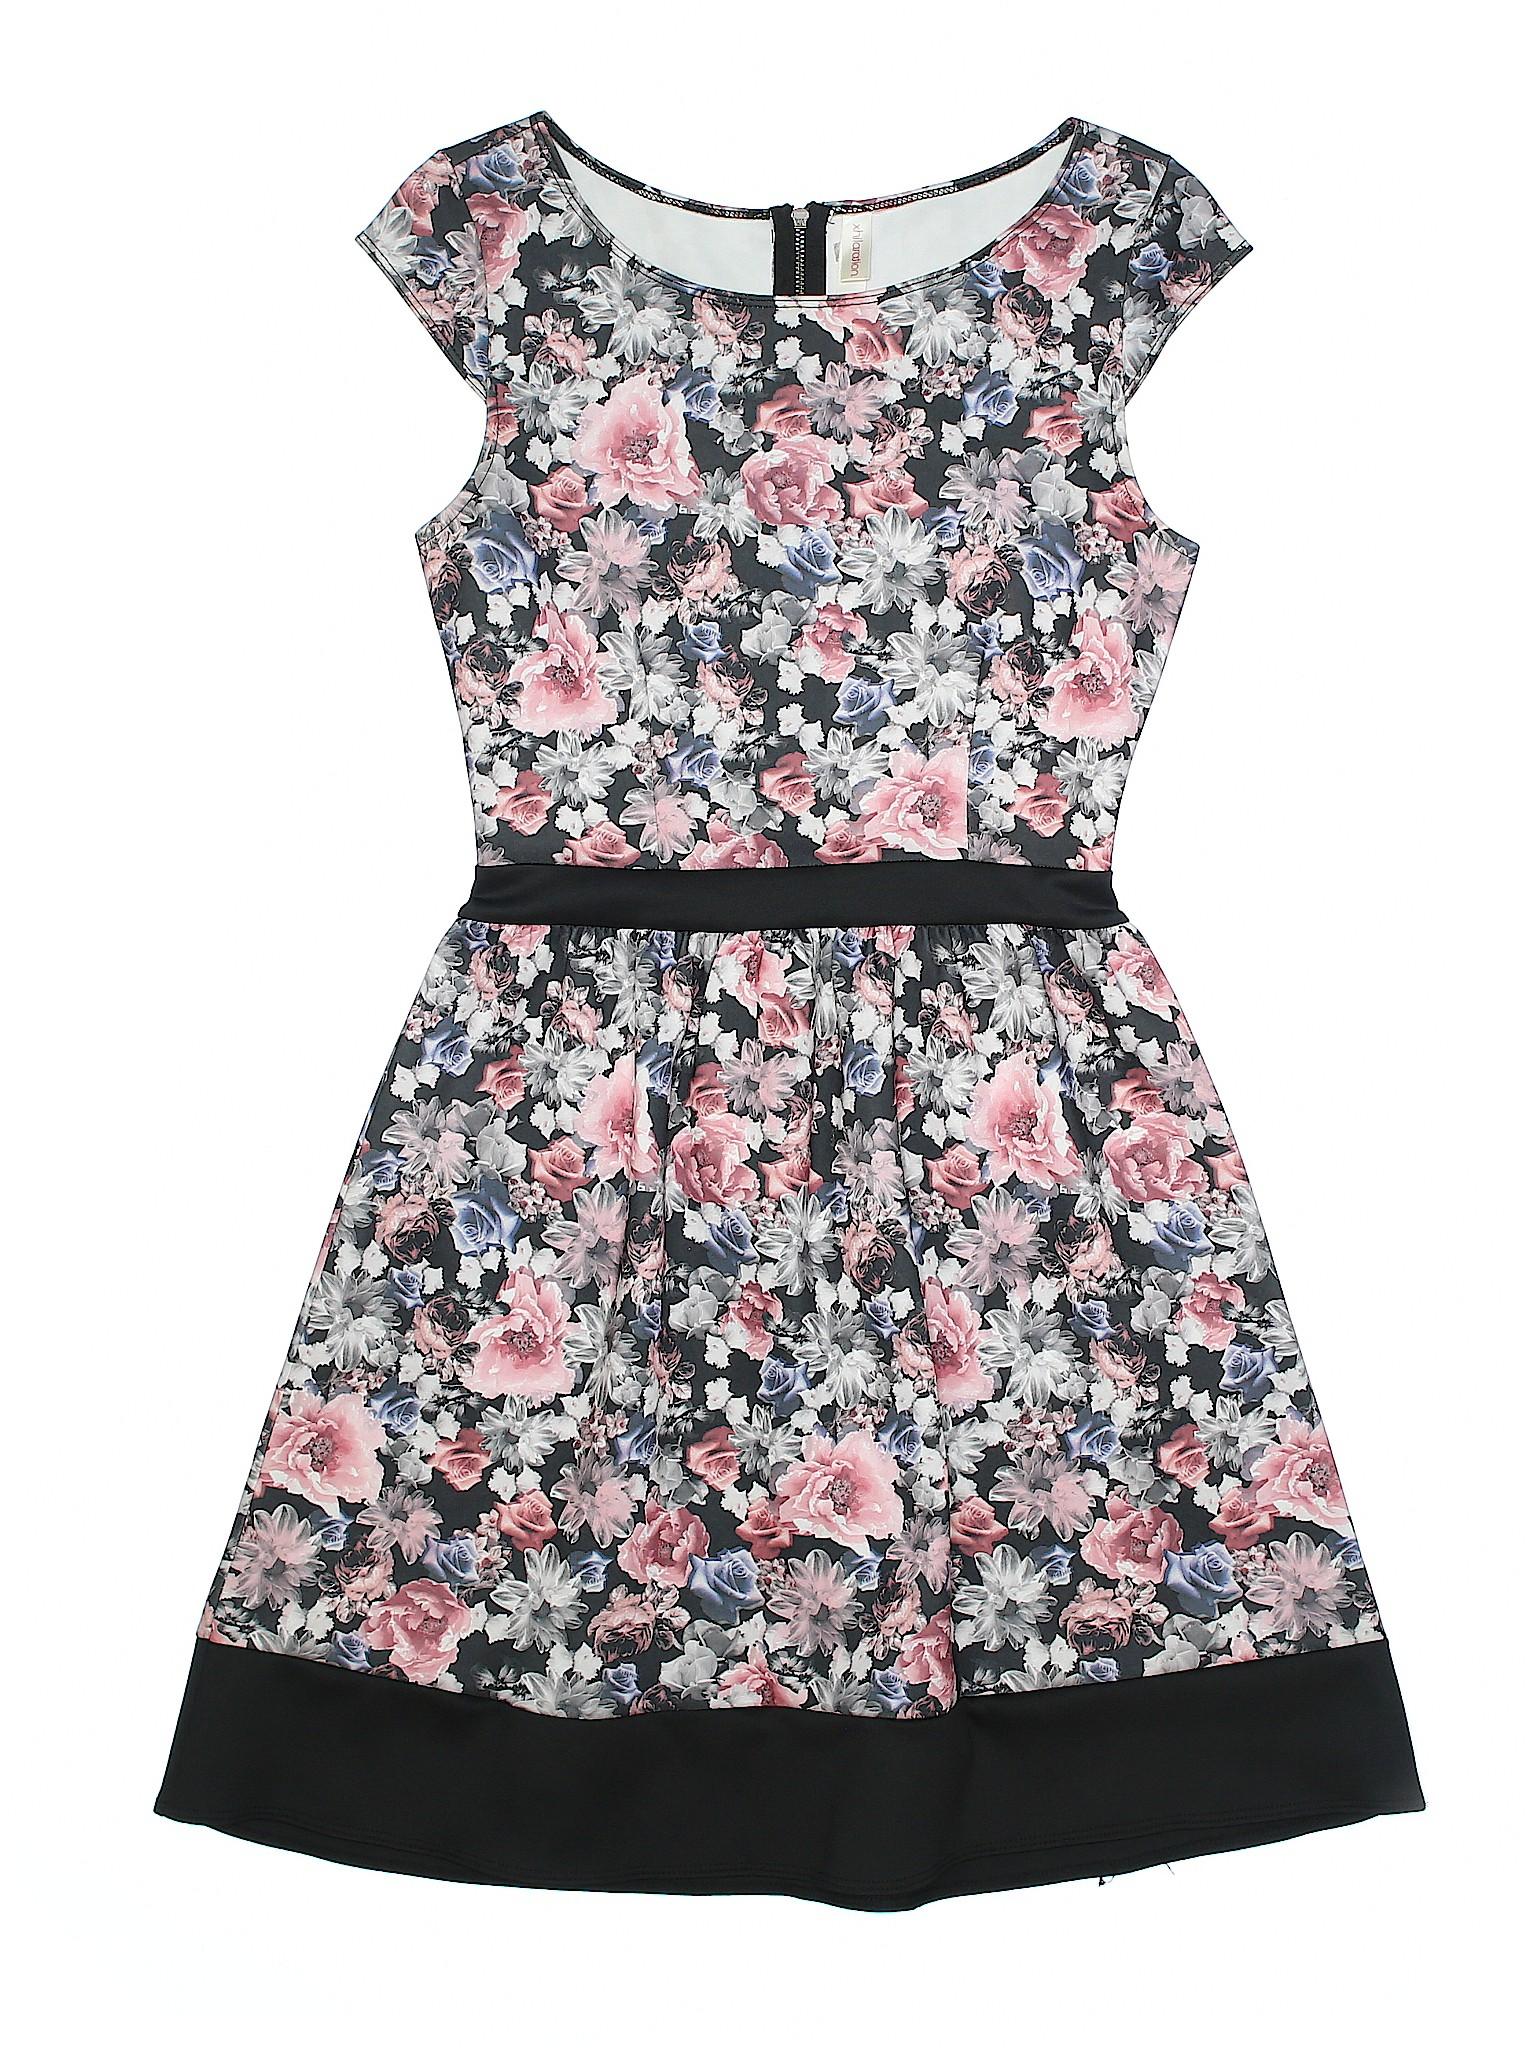 Dress Casual Xhilaration Boutique Boutique Winter Winter 0XgpPw